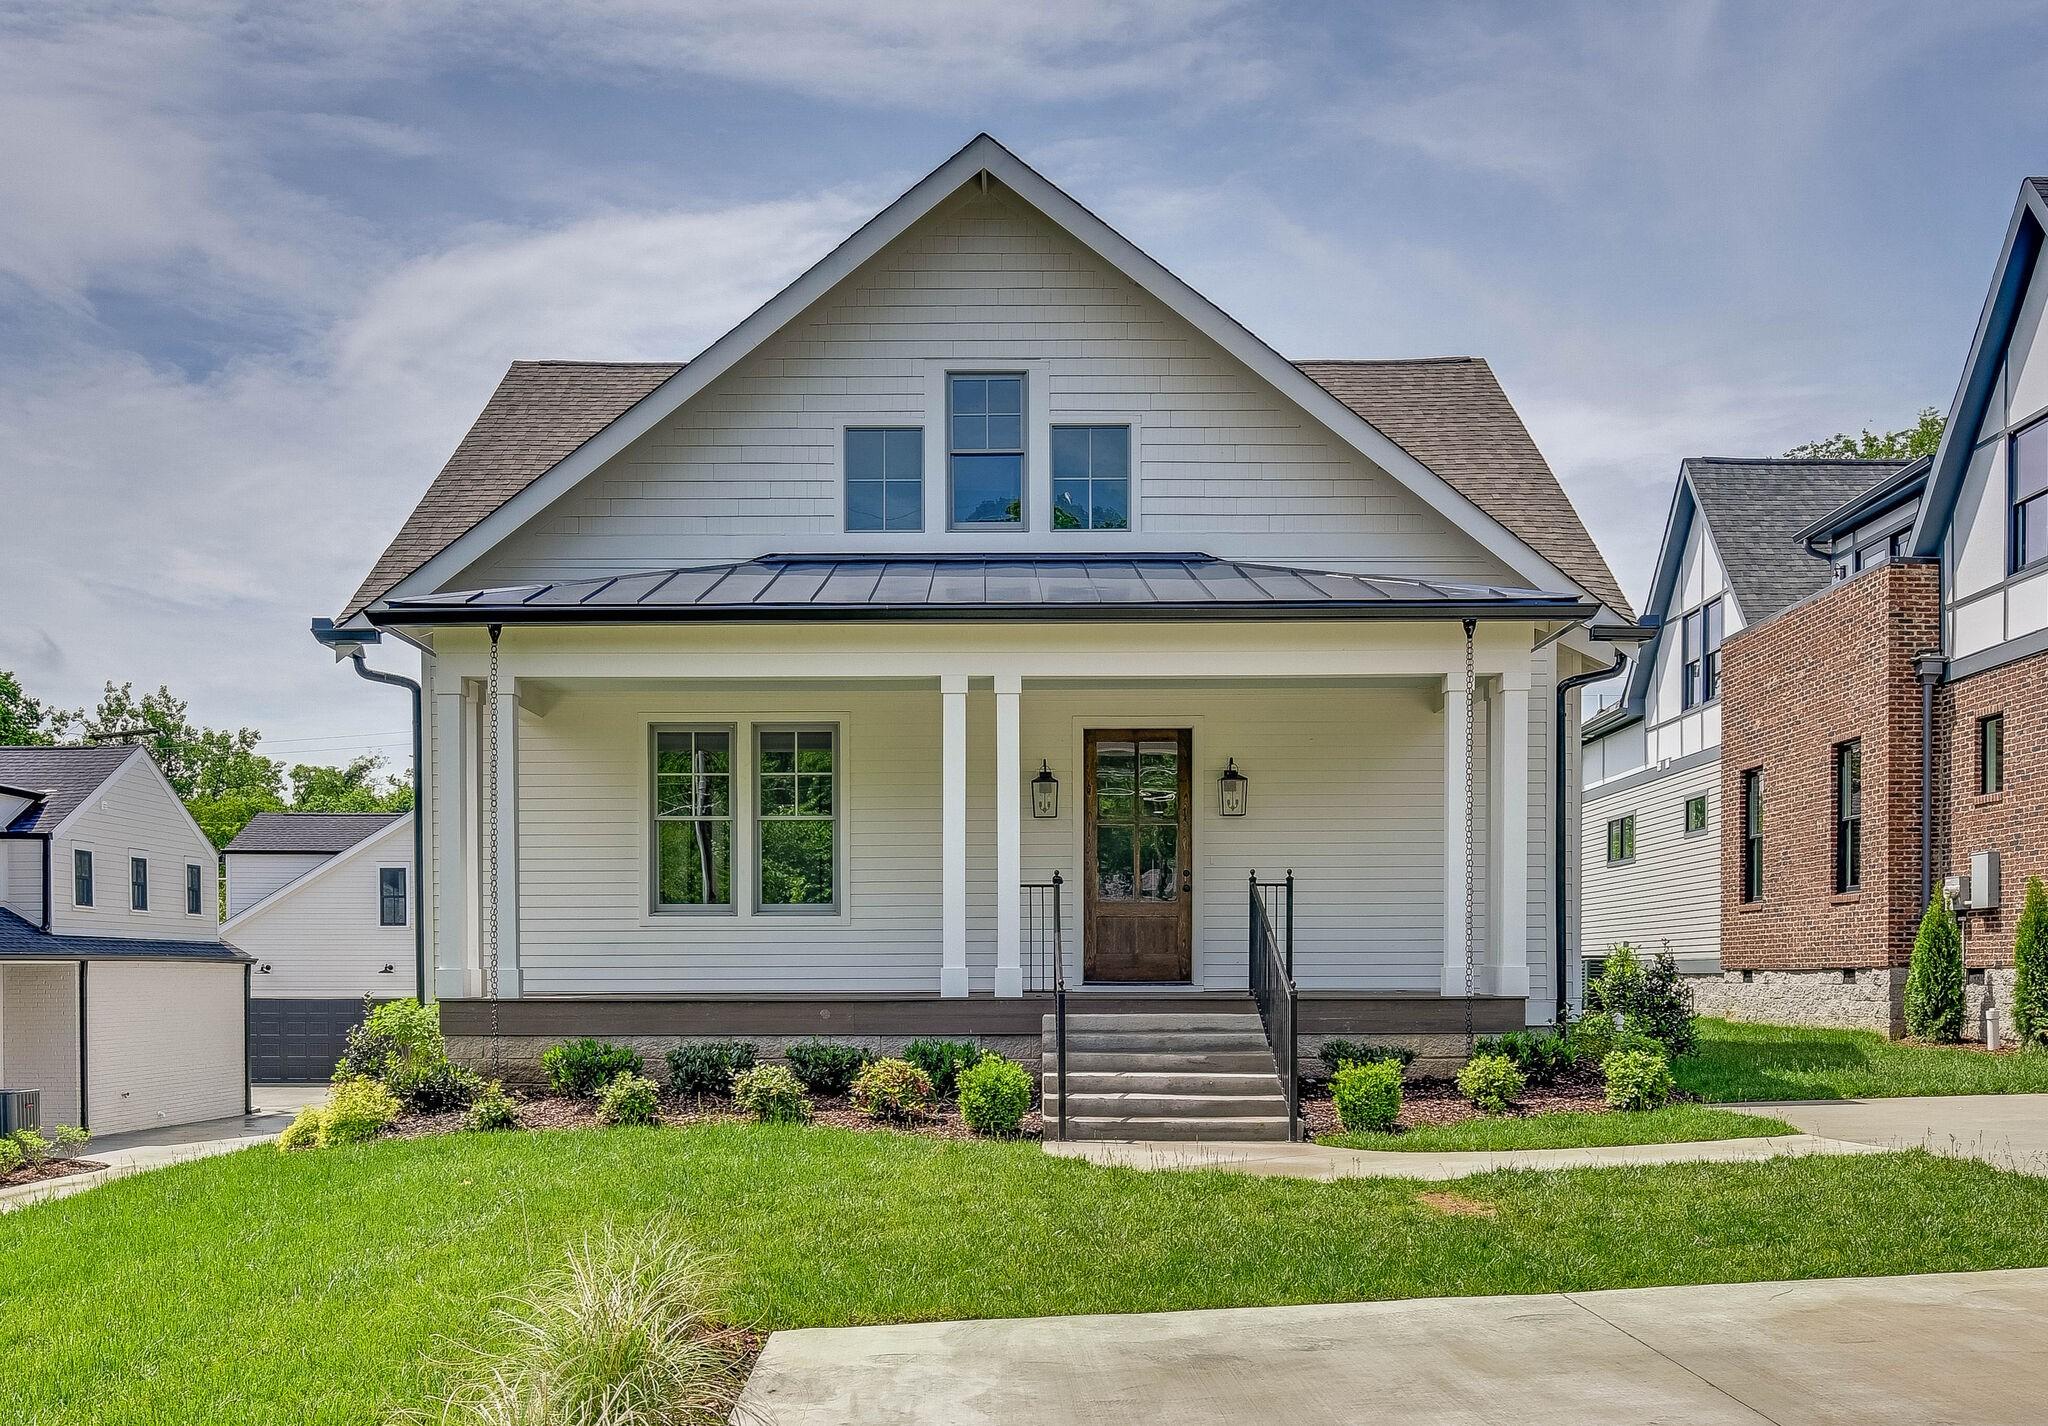 1817 Sweetbriar Ave Property Photo - Nashville, TN real estate listing